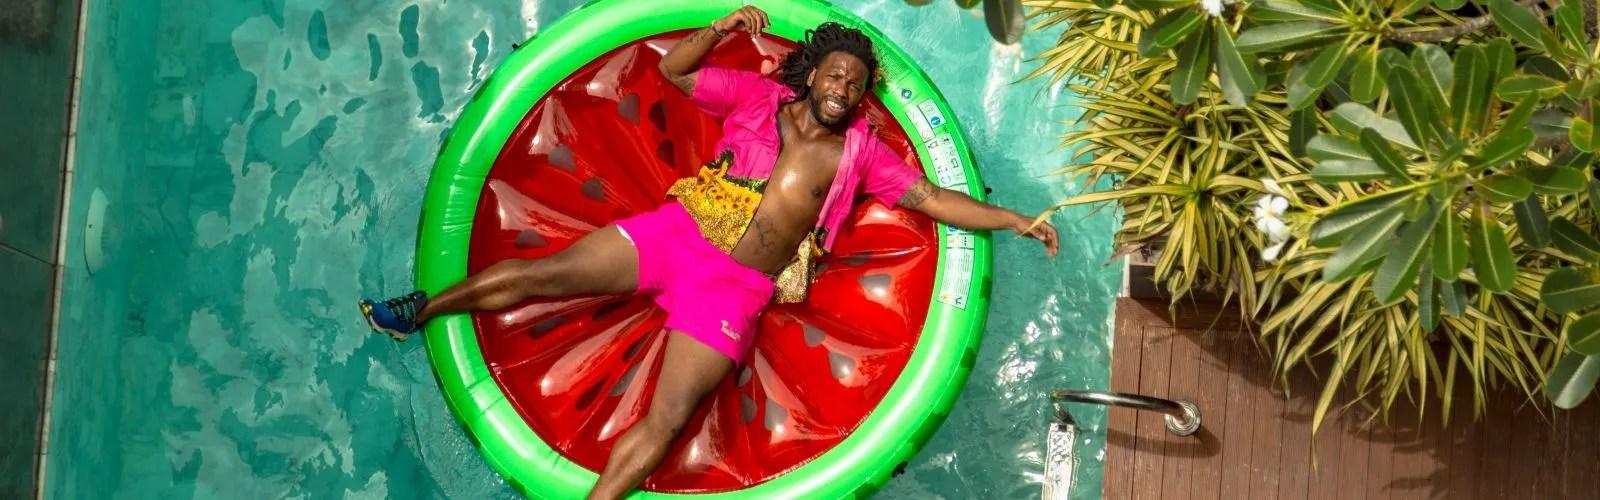 Cute swimsuits - HERO CREDIT William Rouse_Unsplash